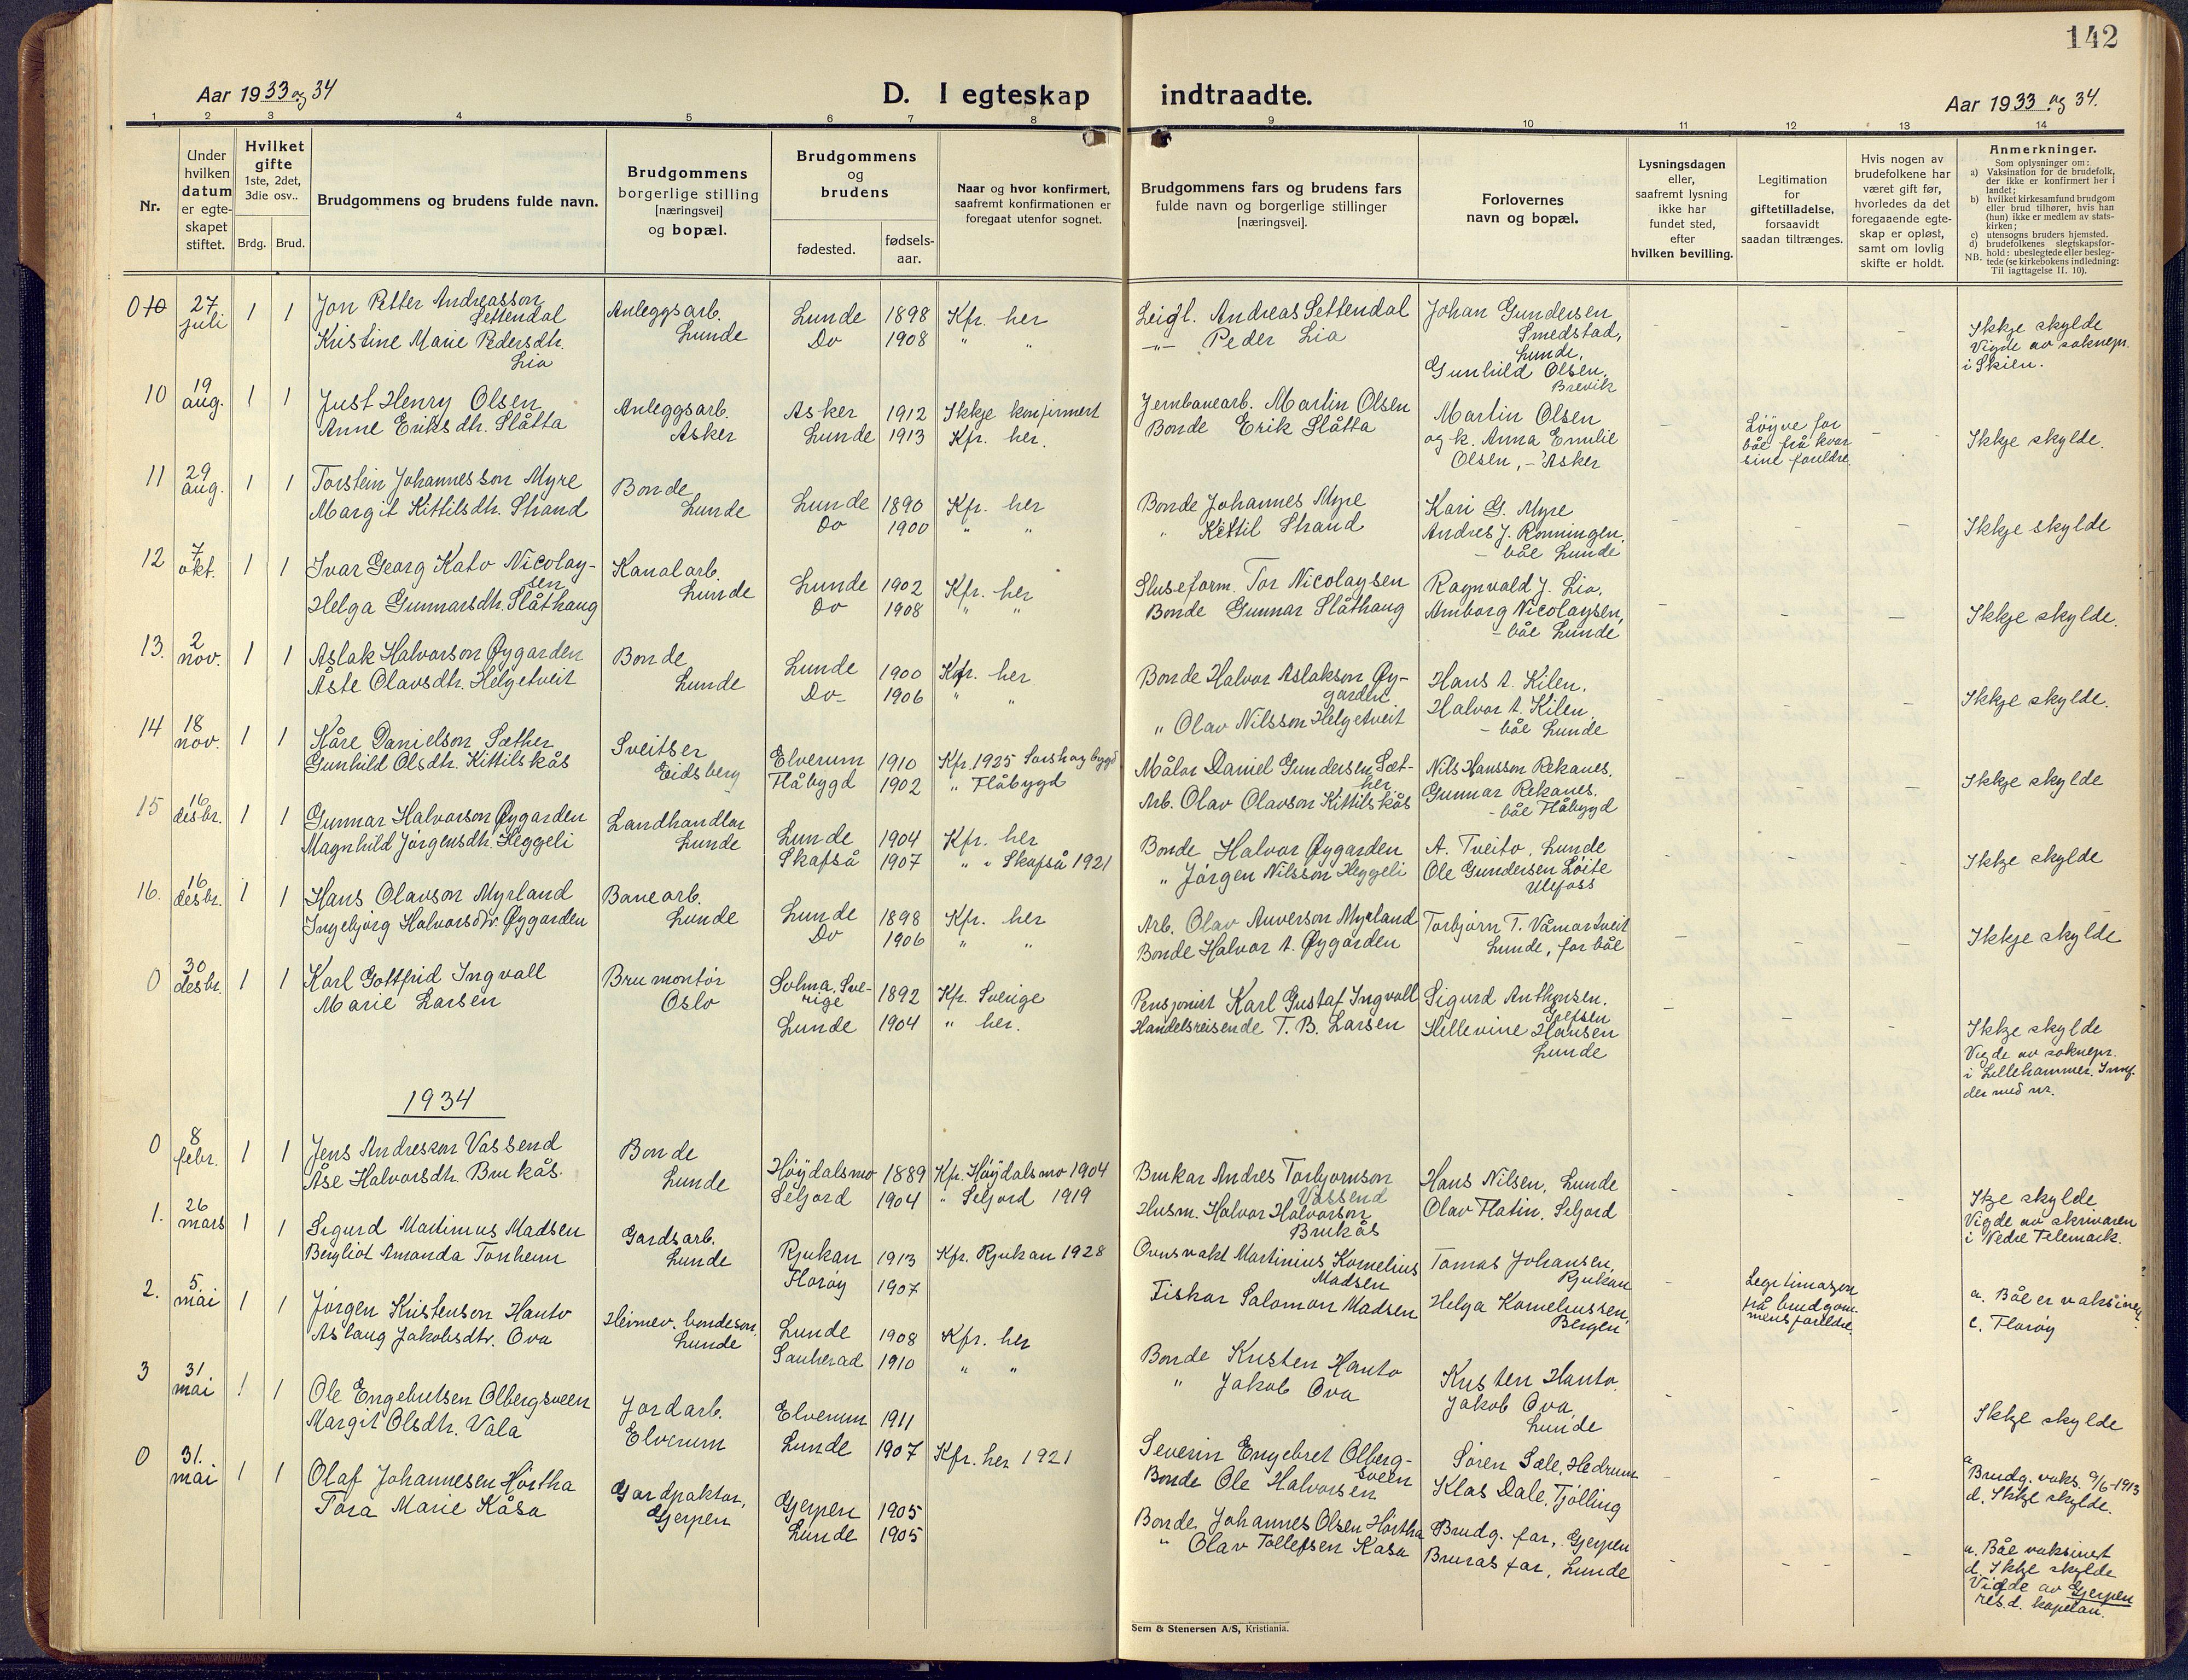 SAKO, Lunde kirkebøker, F/Fa/L0006: Ministerialbok nr. I 6, 1922-1940, s. 142